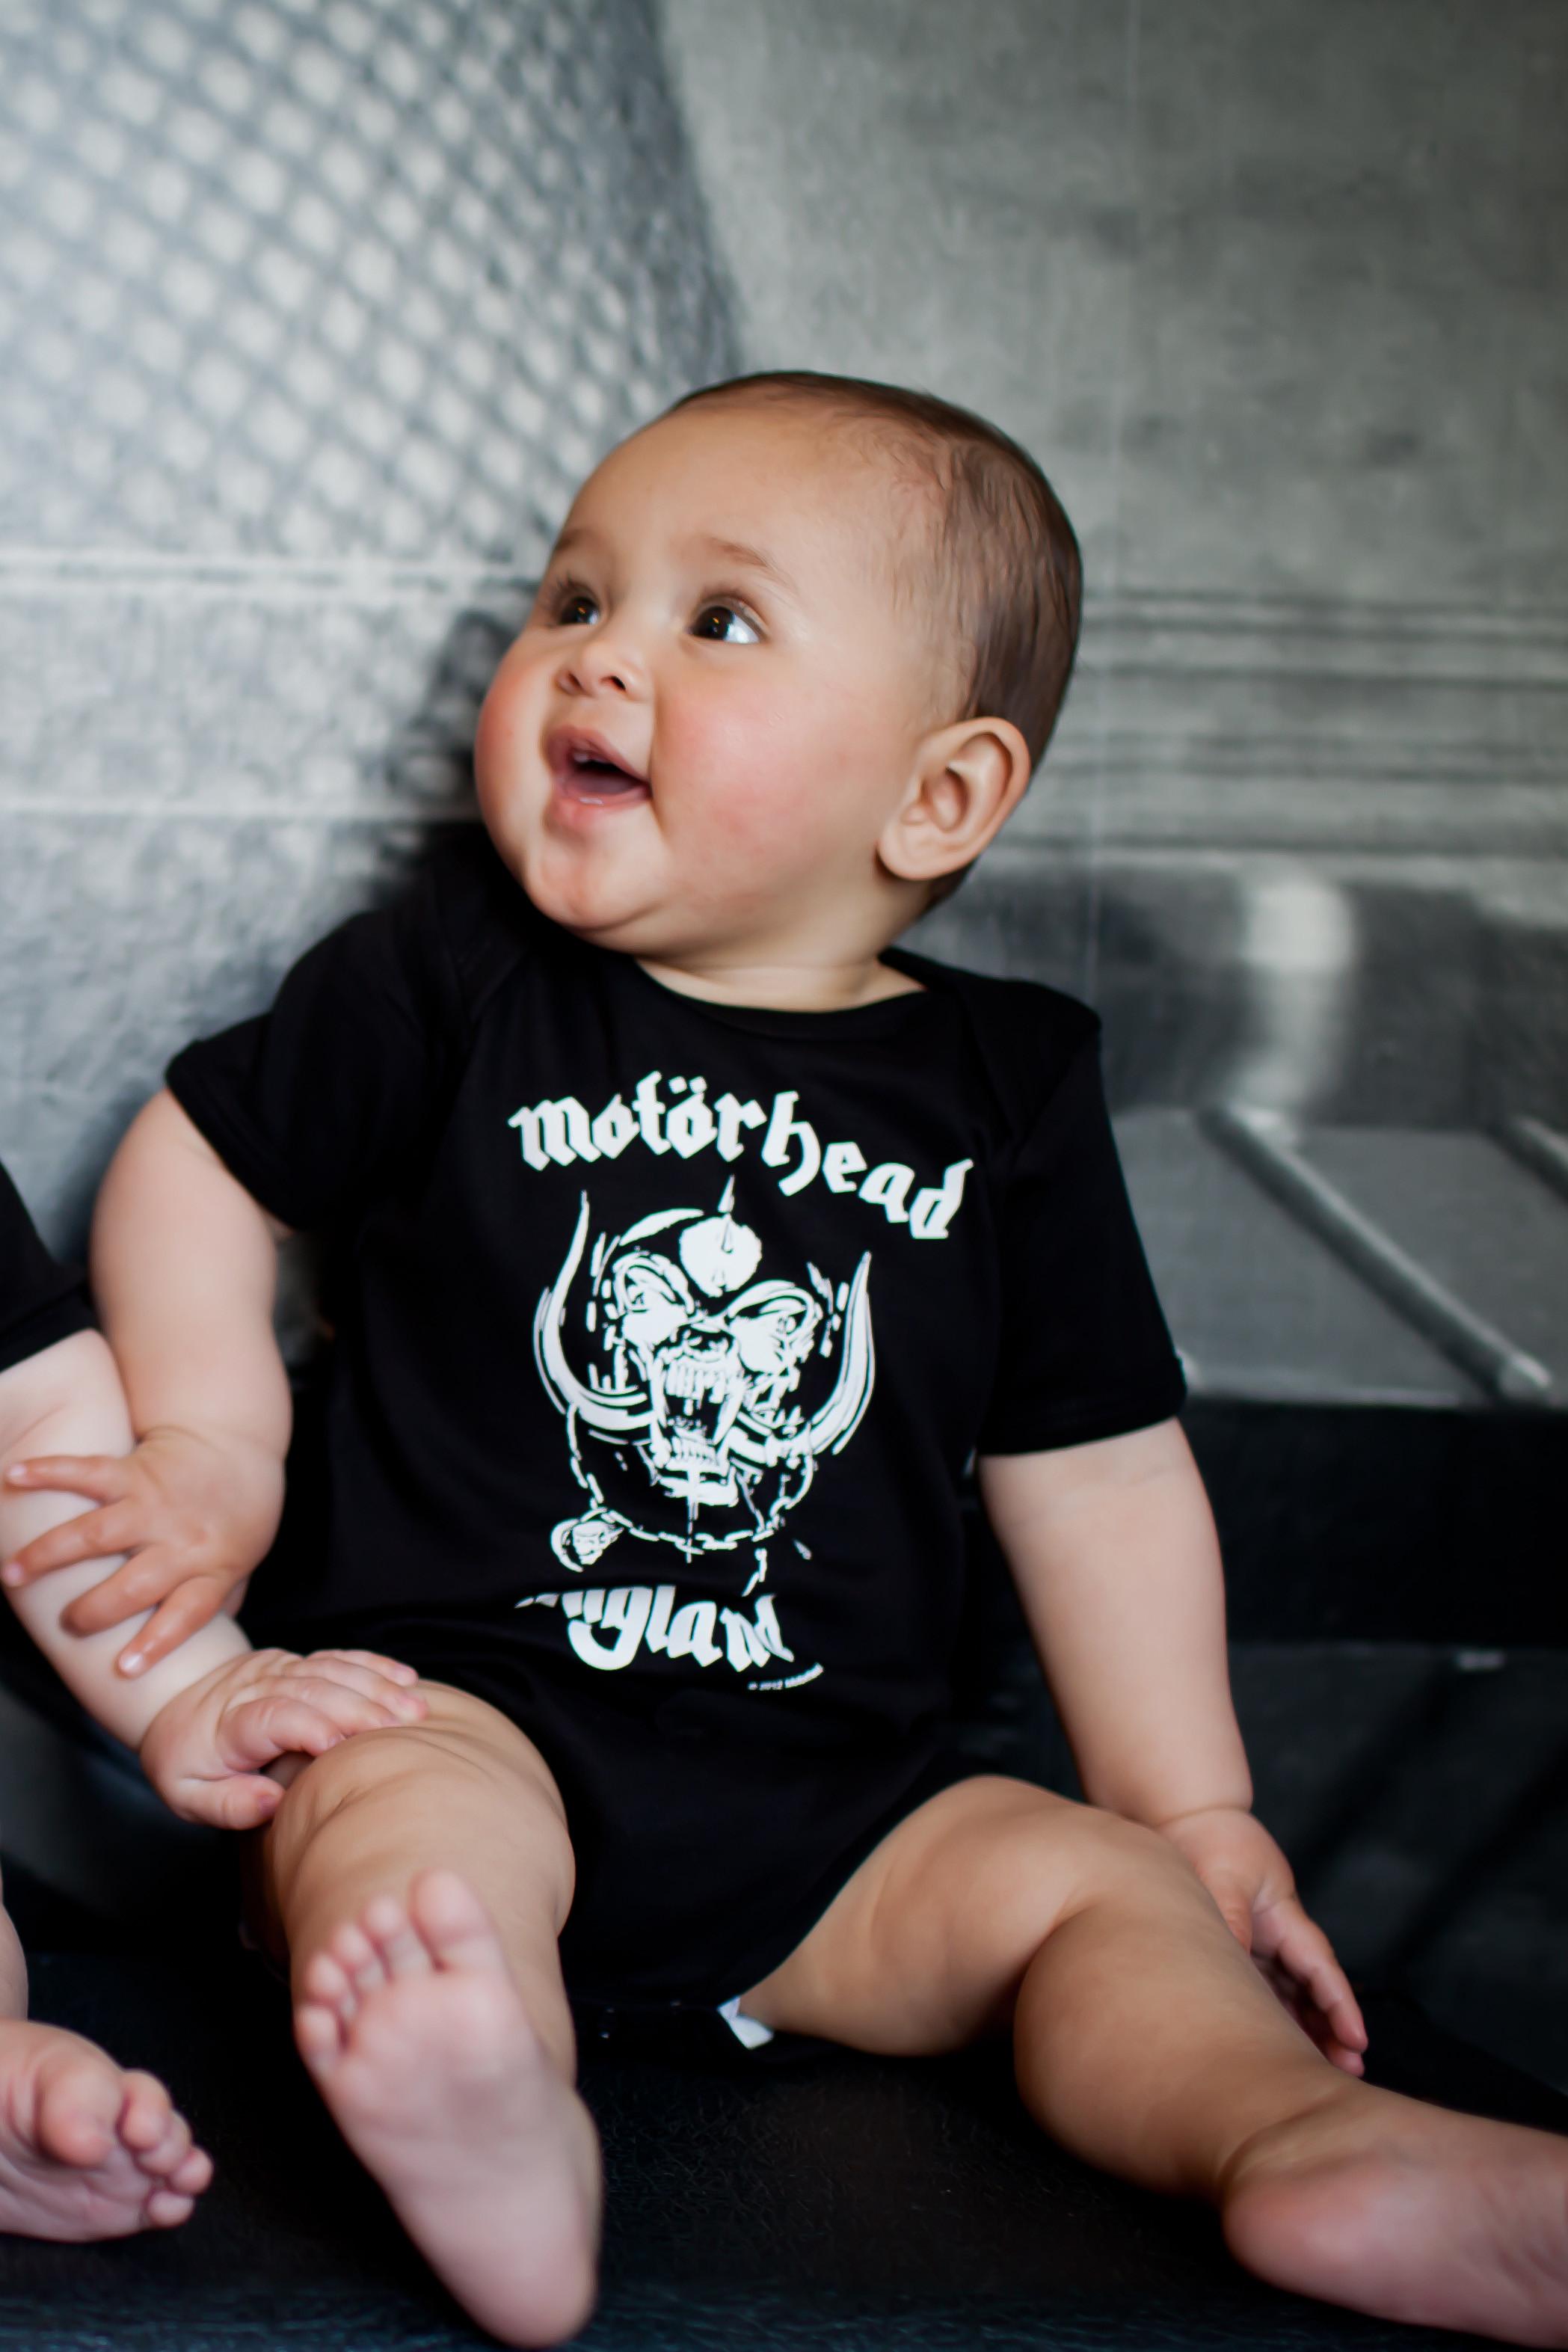 Motorhead baby romper England